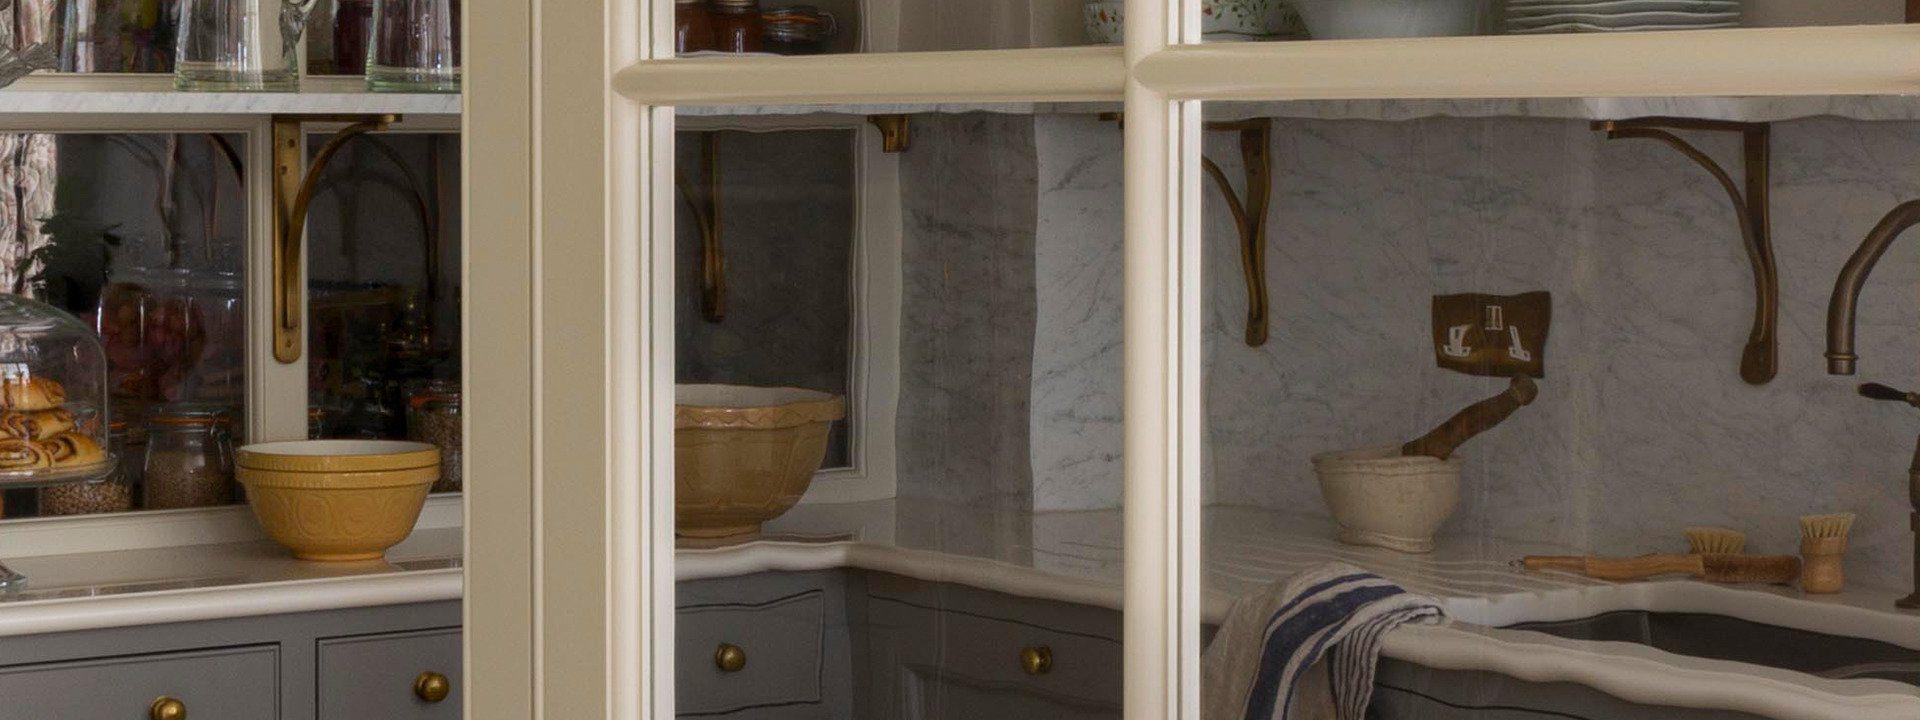 scullery kitchen glazing